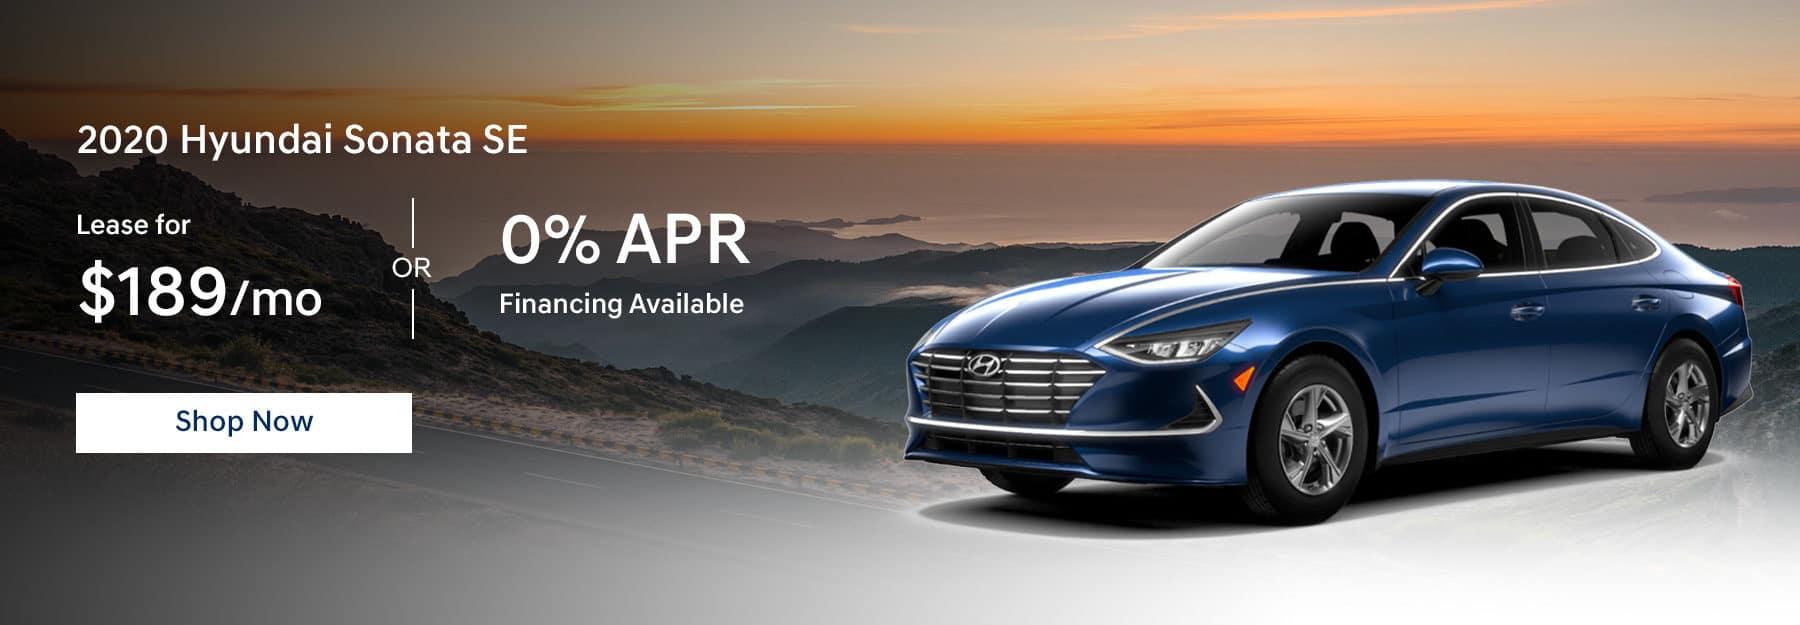 2020 Hyundai Sonata Lease for $189/mo or 0% APR